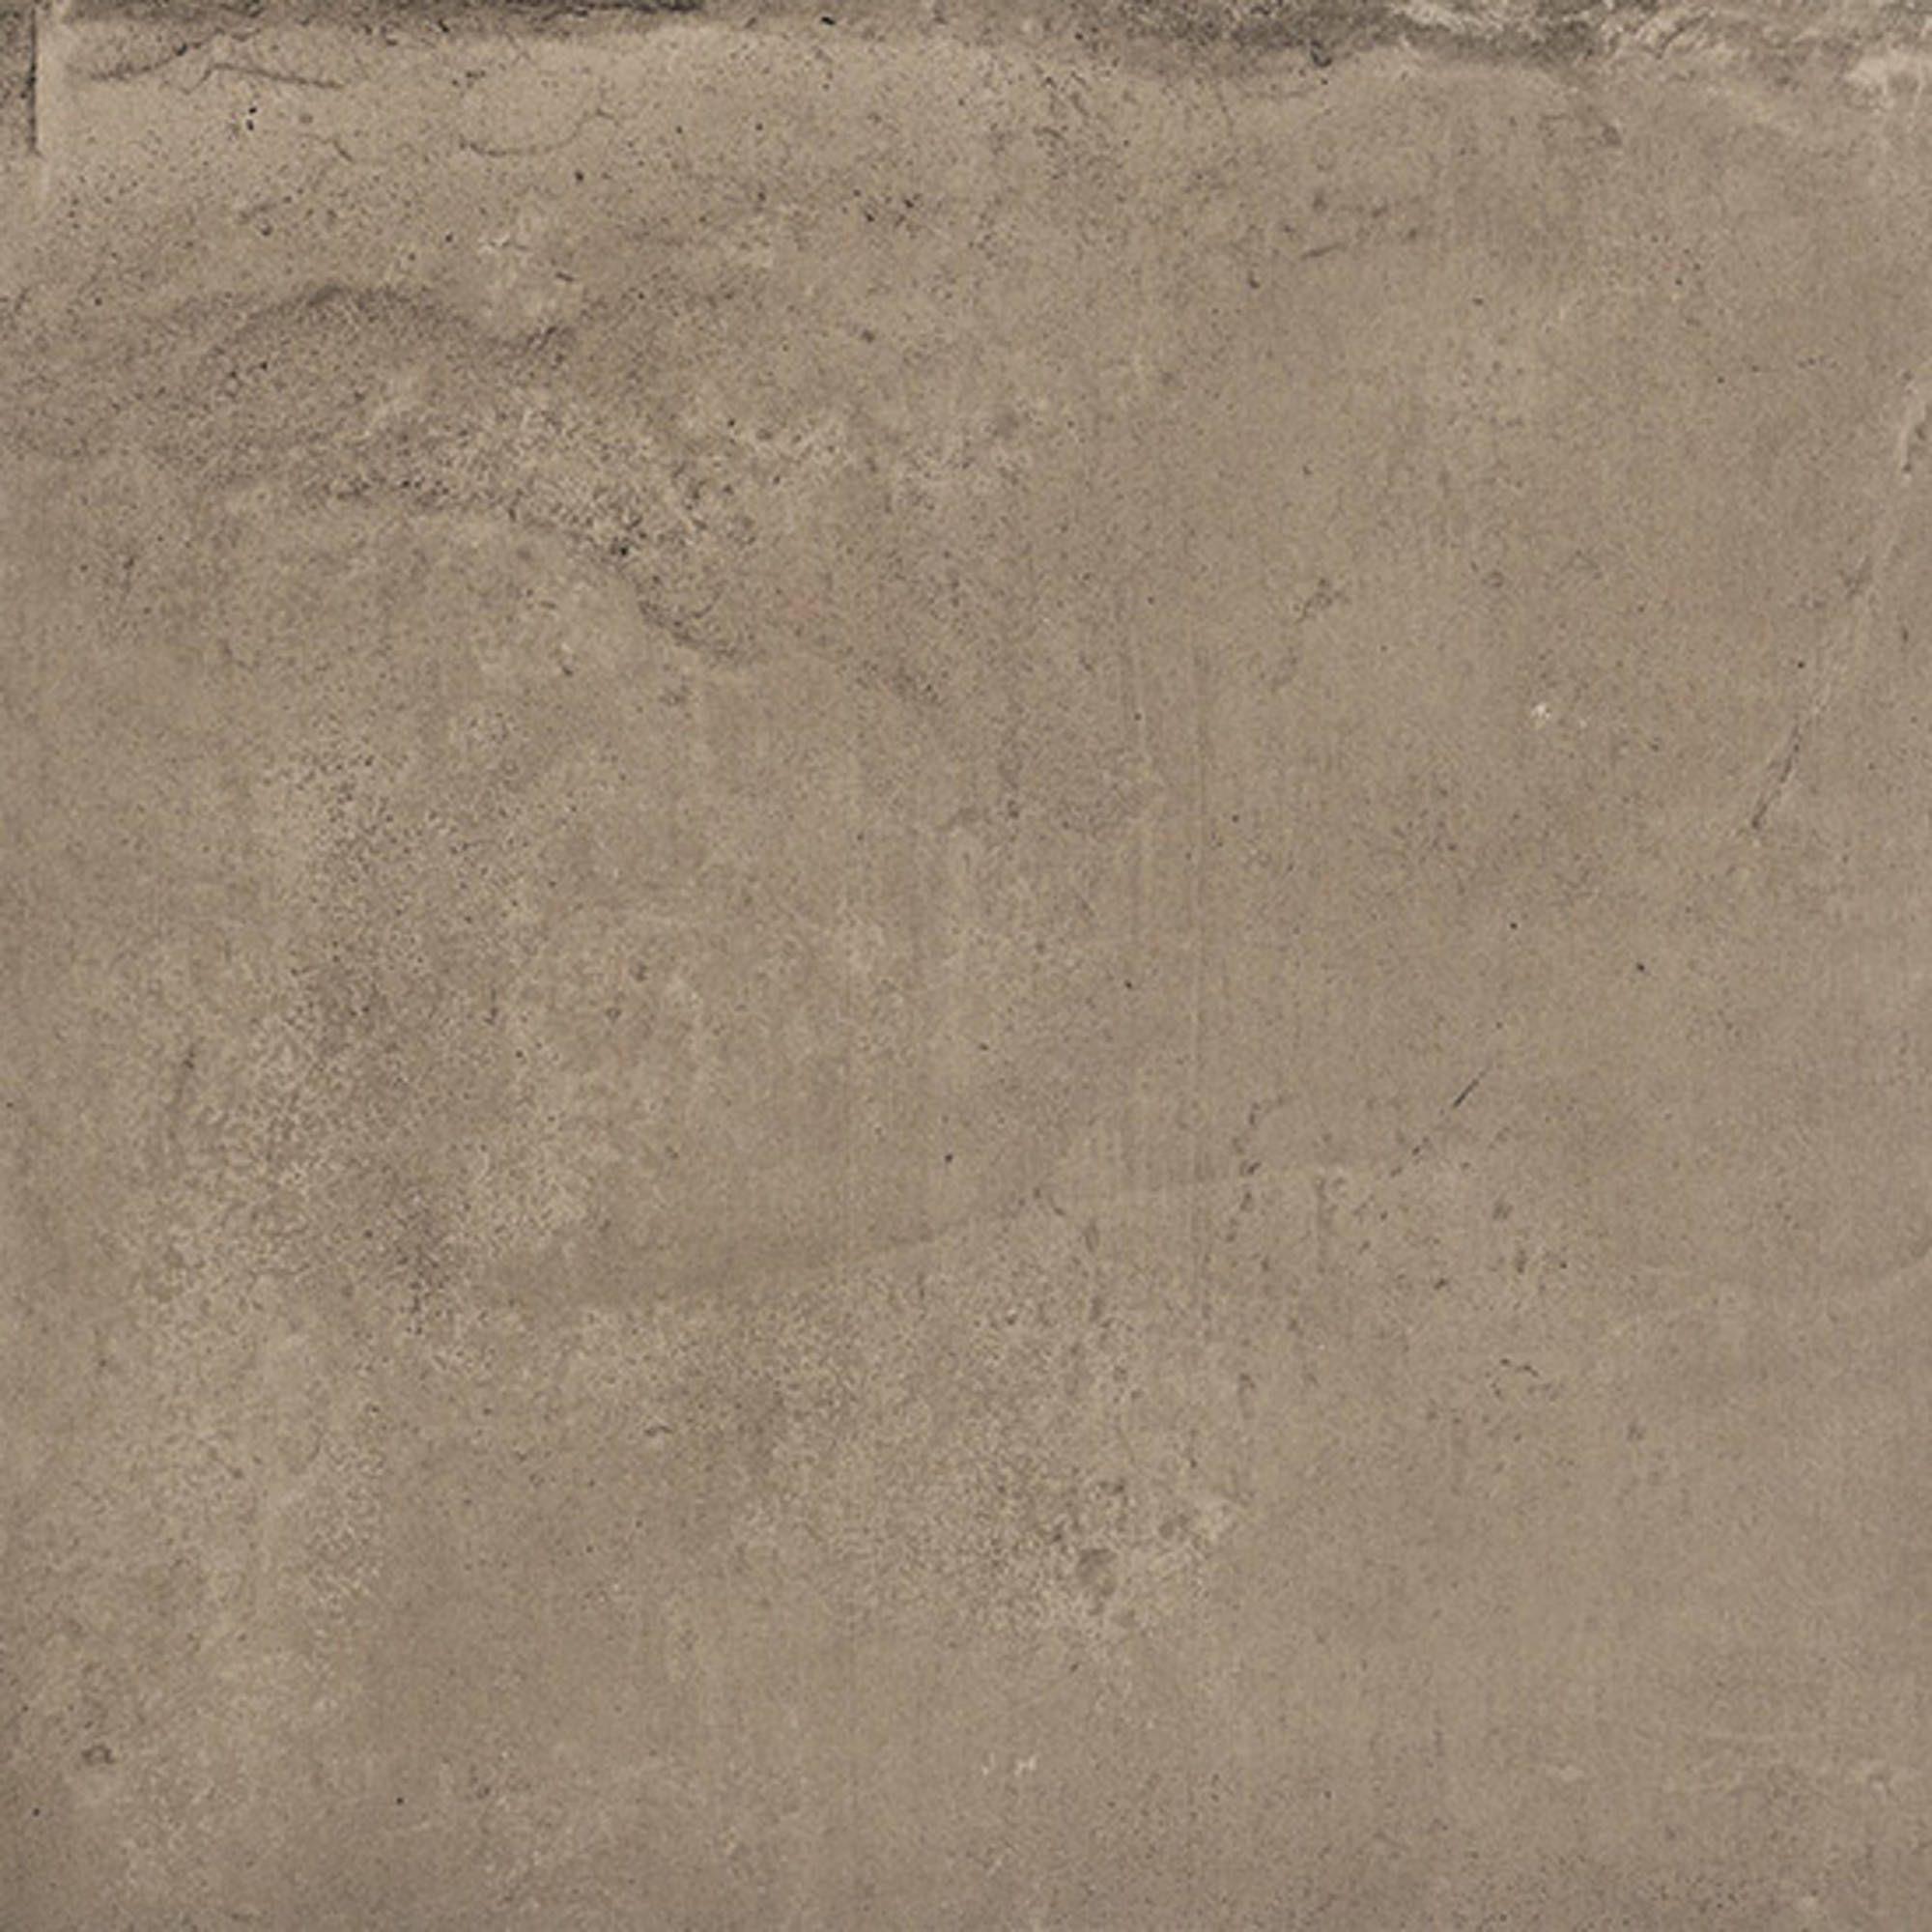 Vloertegel Coem Cottocemento 75,5x75,5x1 cm Brown 1,14M2